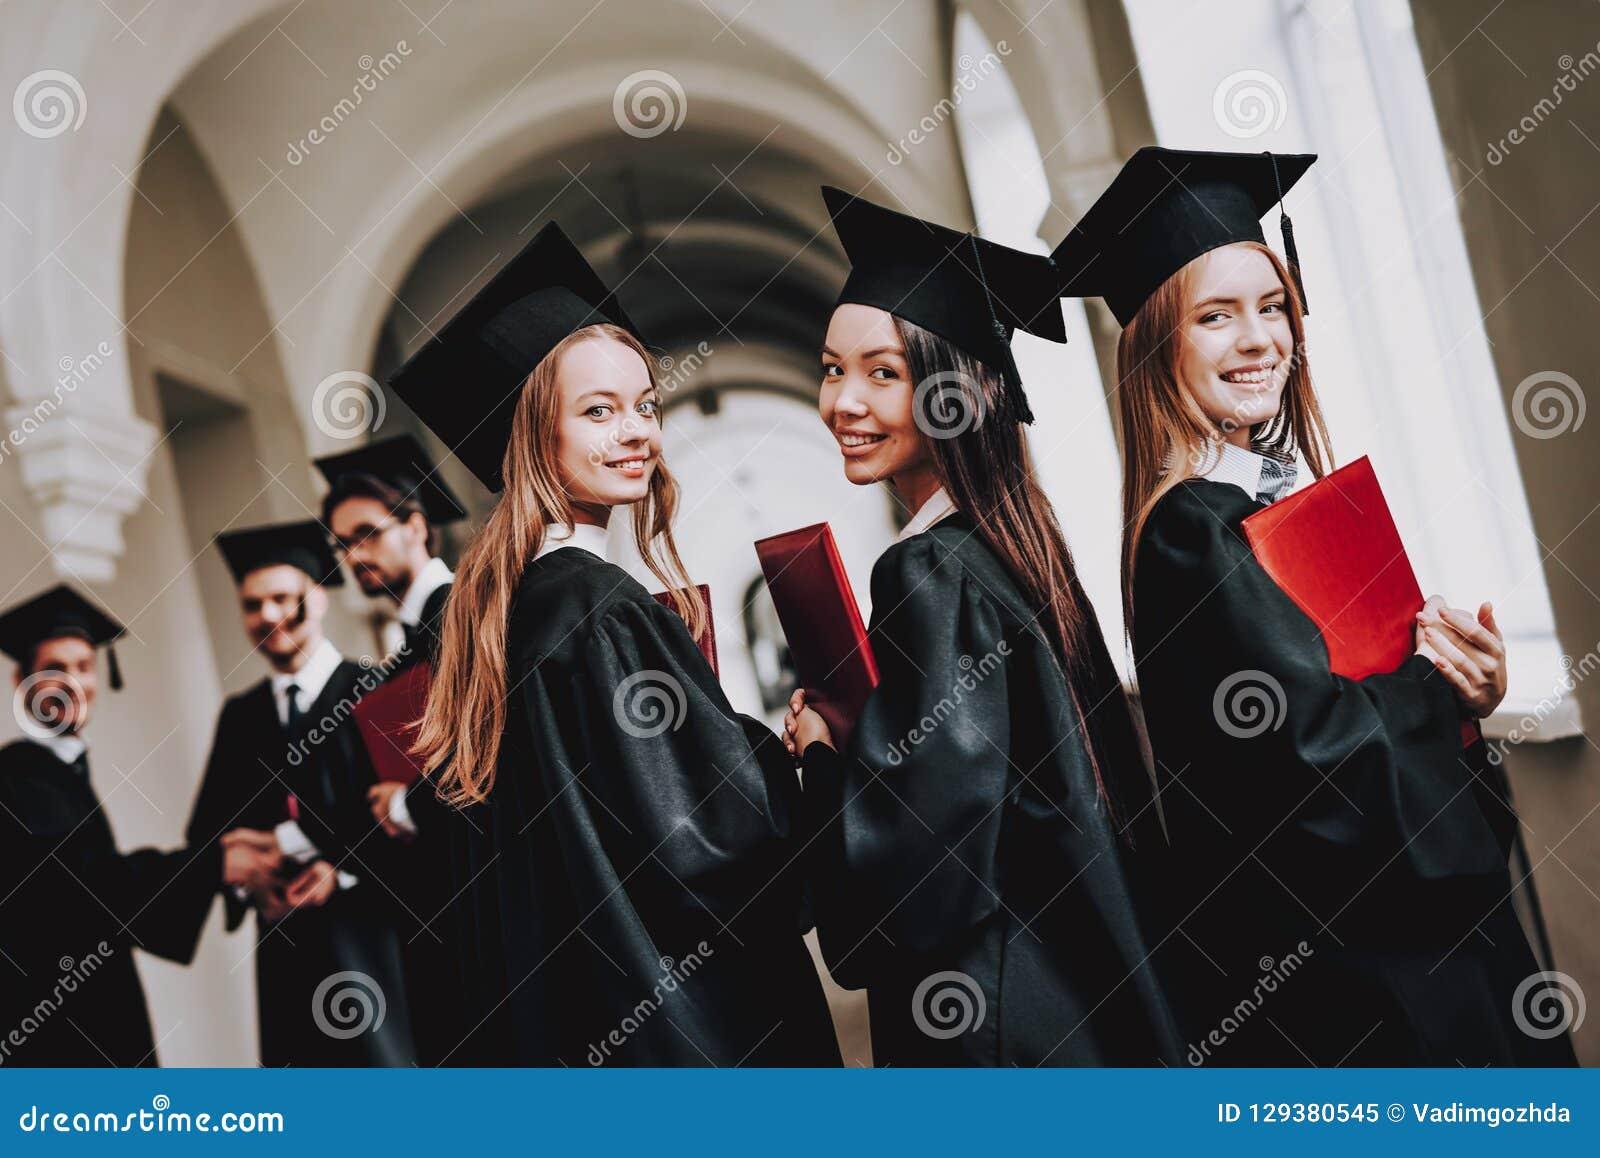 Gang universiteit meisjes robes universiteit